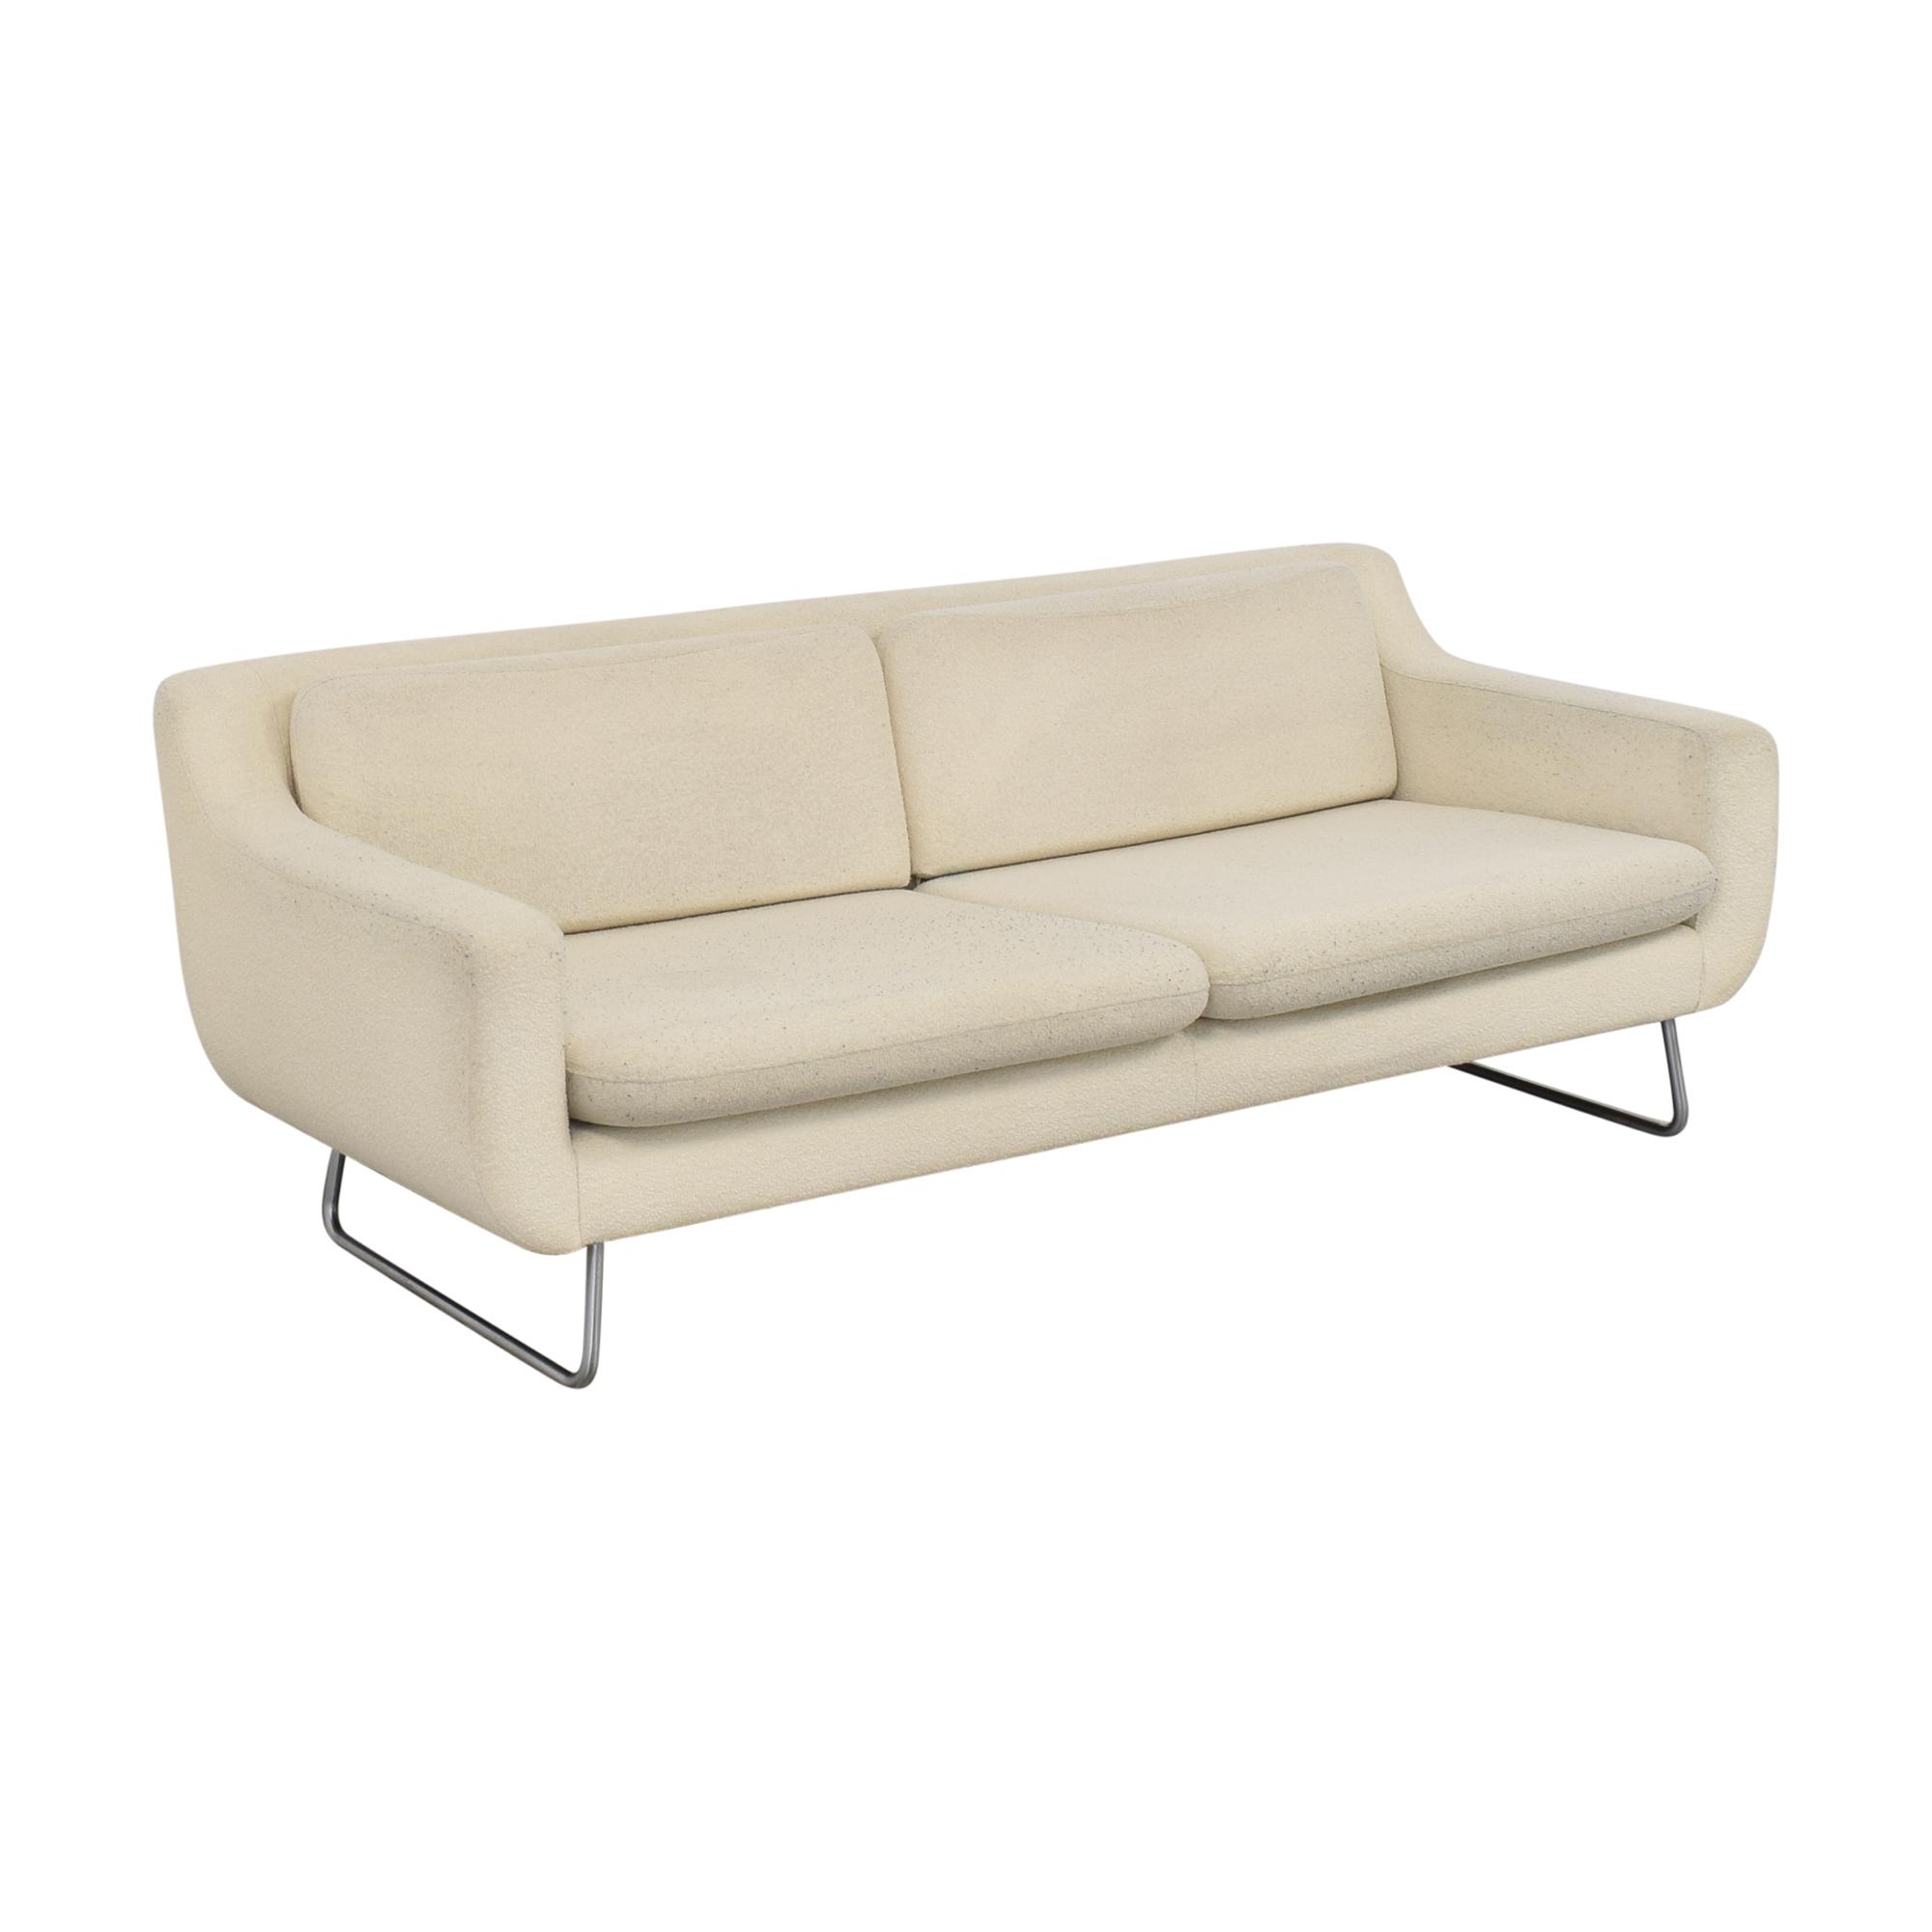 buy Content by Conran Aspen Two Cushion Sofa The Conran Shop